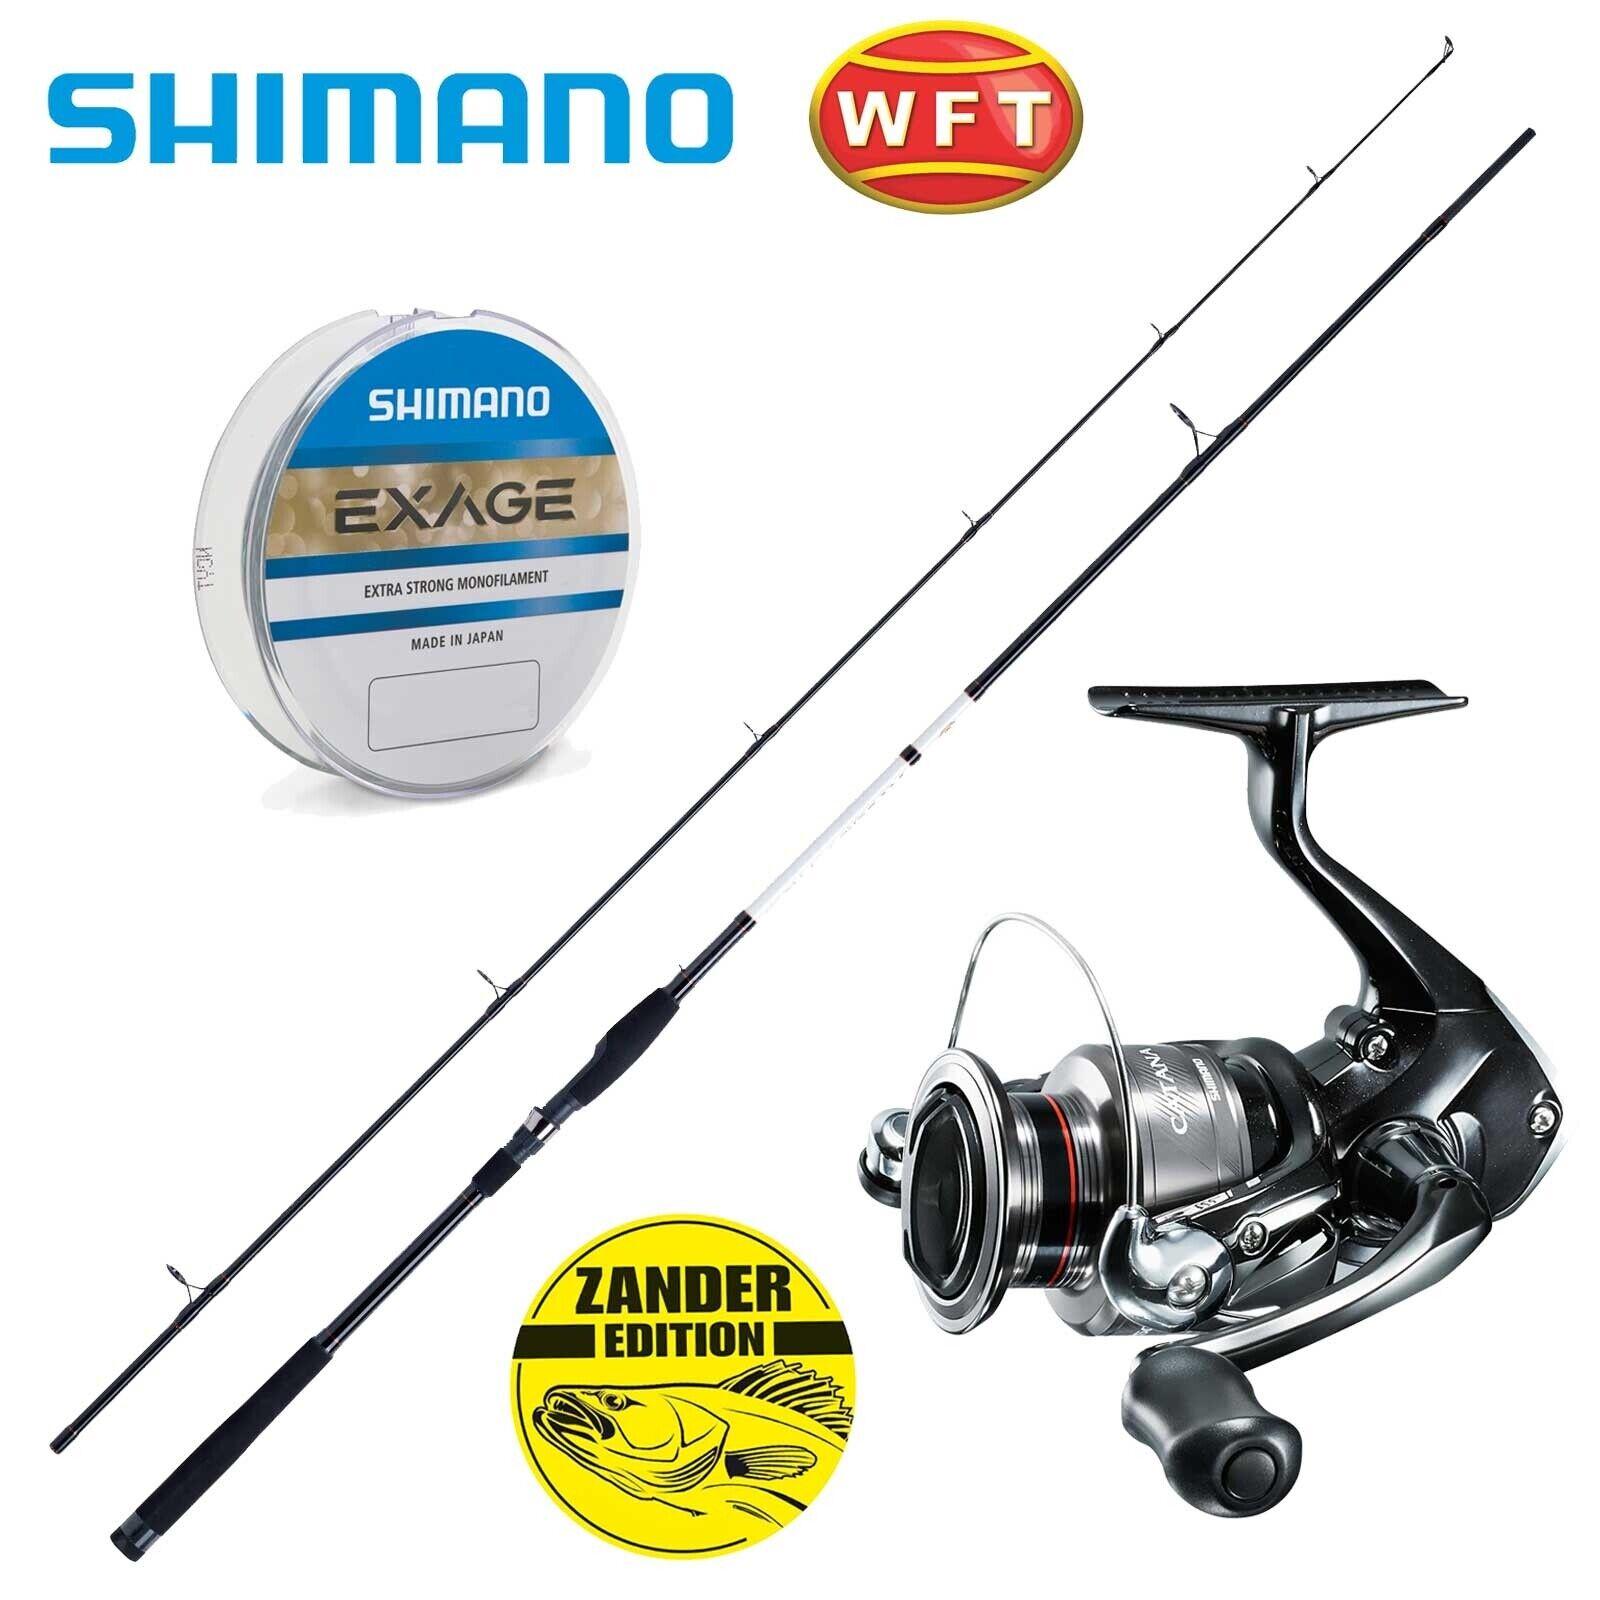 Persico completauominite Pesca ComboWFT stadia 2,70m 844g & Shiuomoo ruolo & Corda